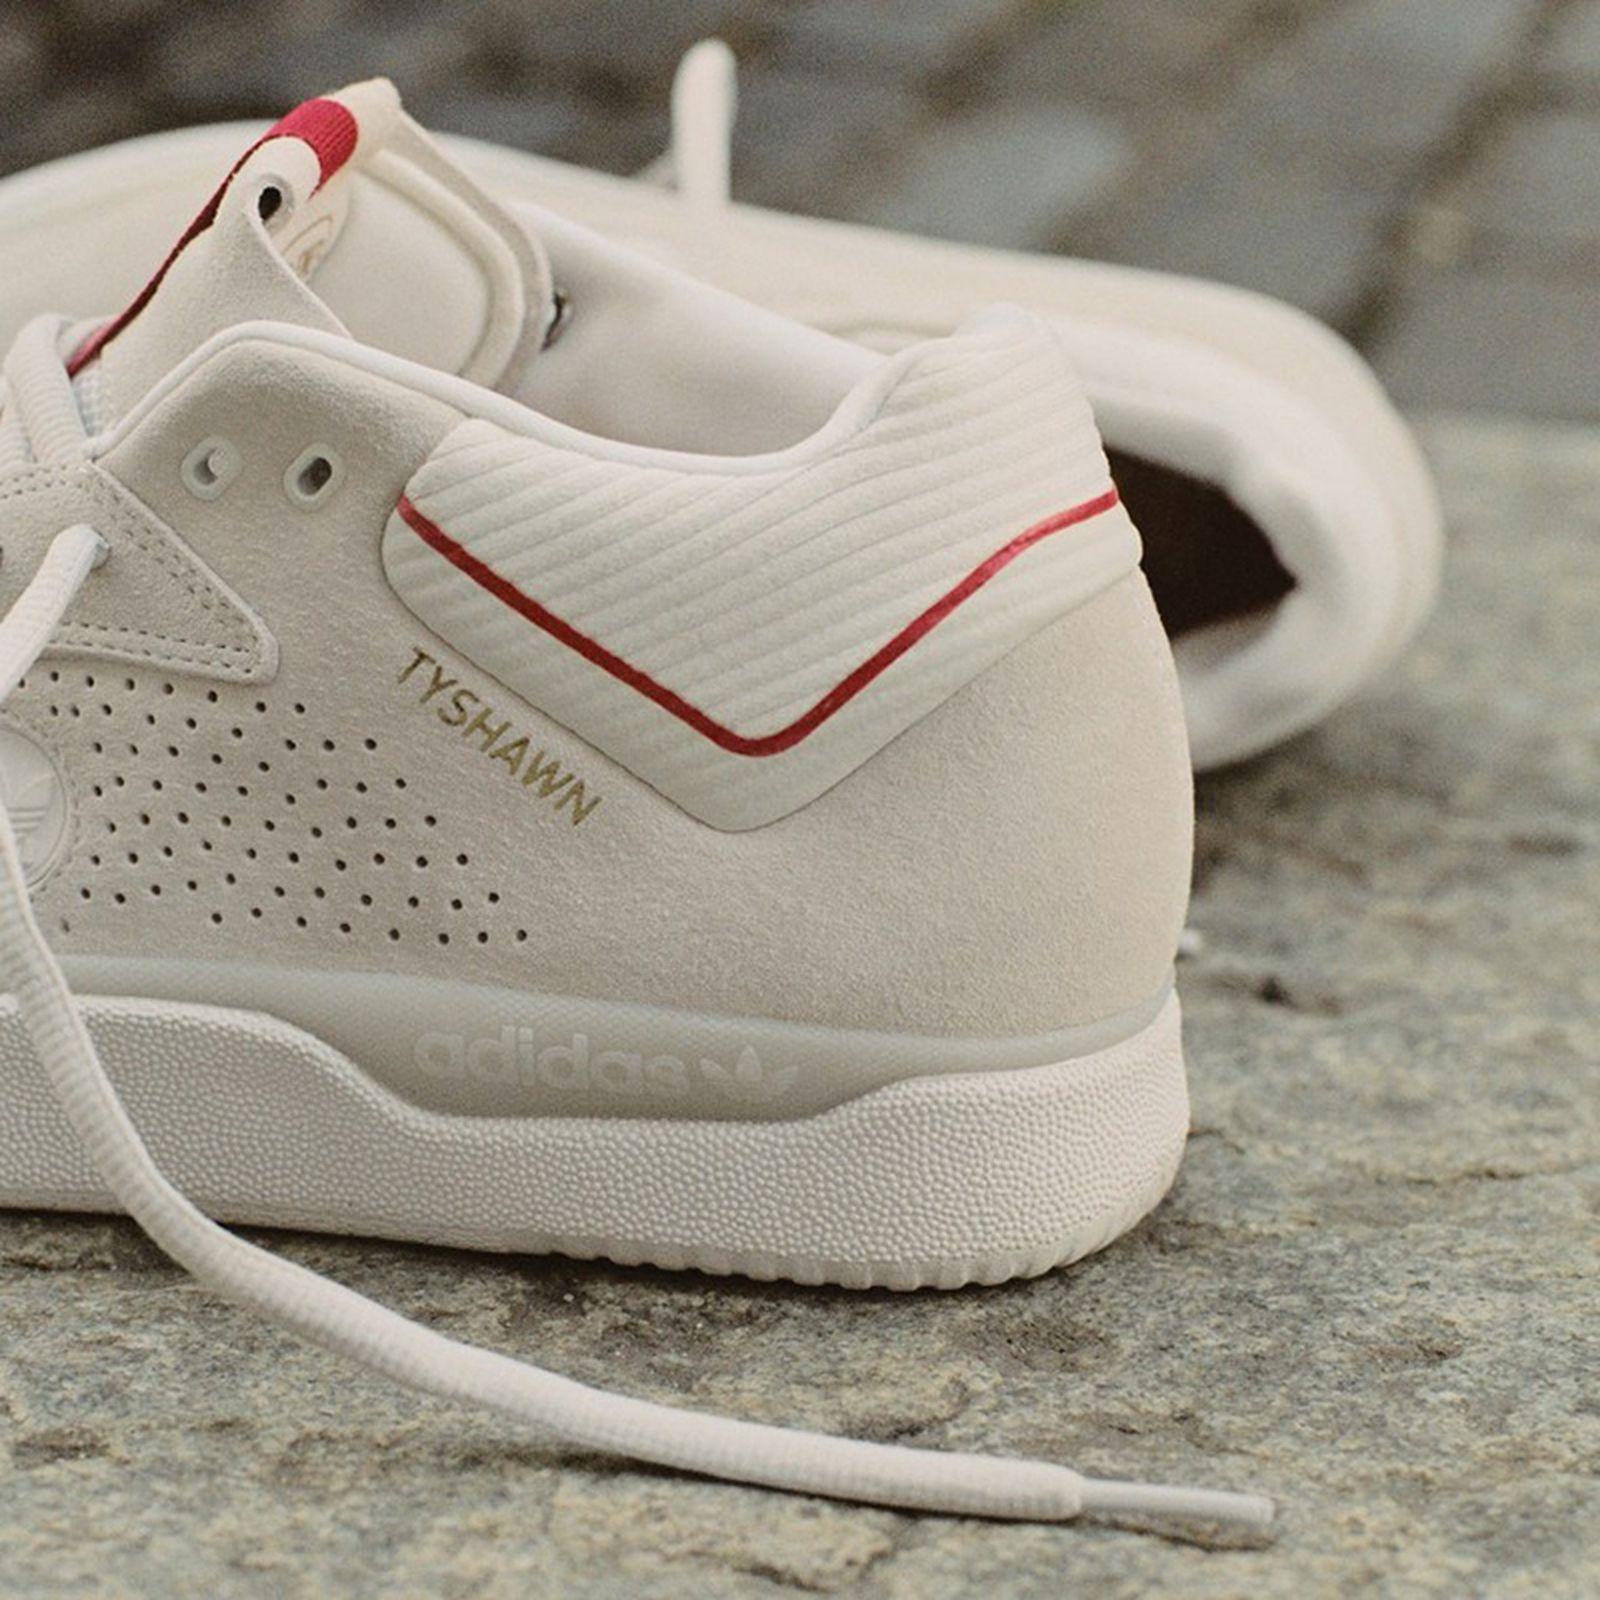 thrasher-adidas-superstar-adv-tyshawn-jones-release-date-price-07